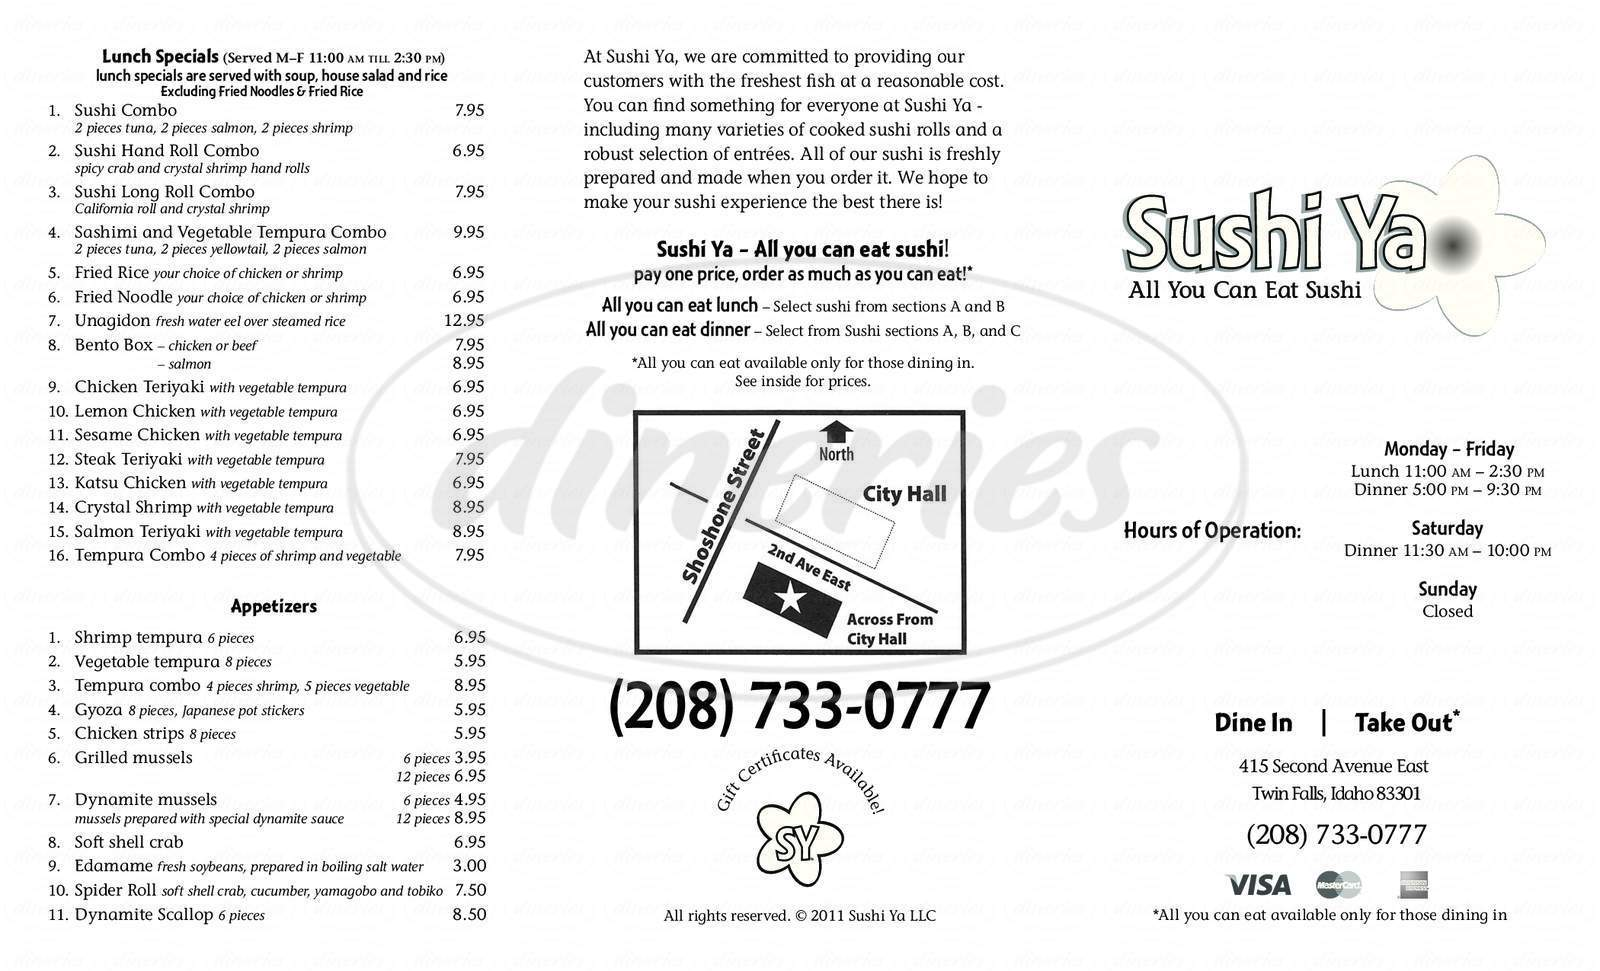 menu for Sushi Ya